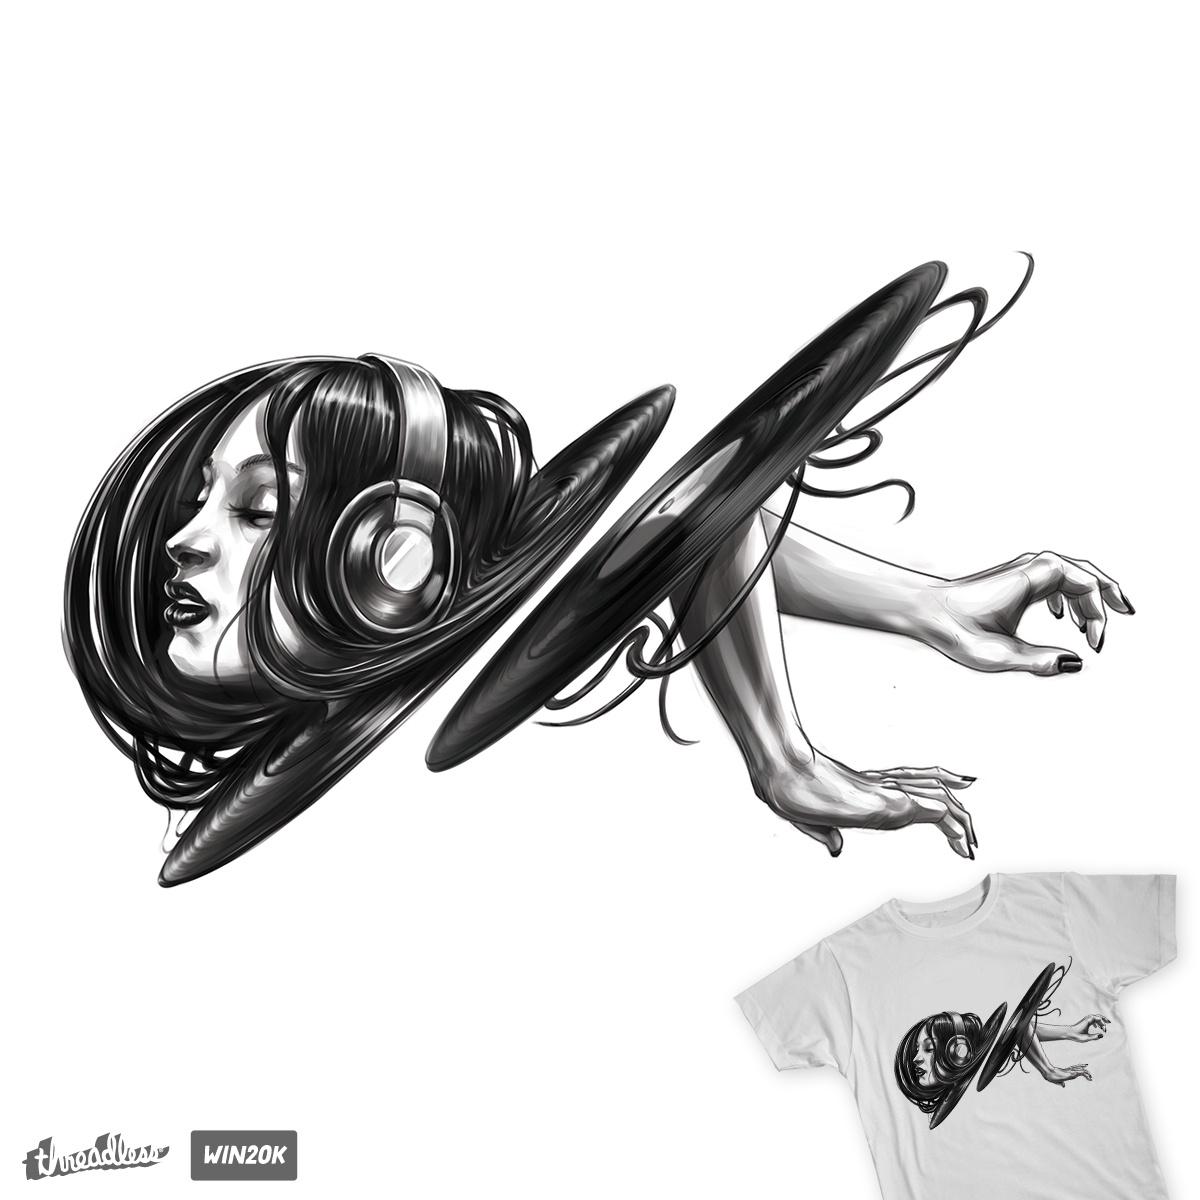 Vinyl Portal by jamesoreilly on Threadless